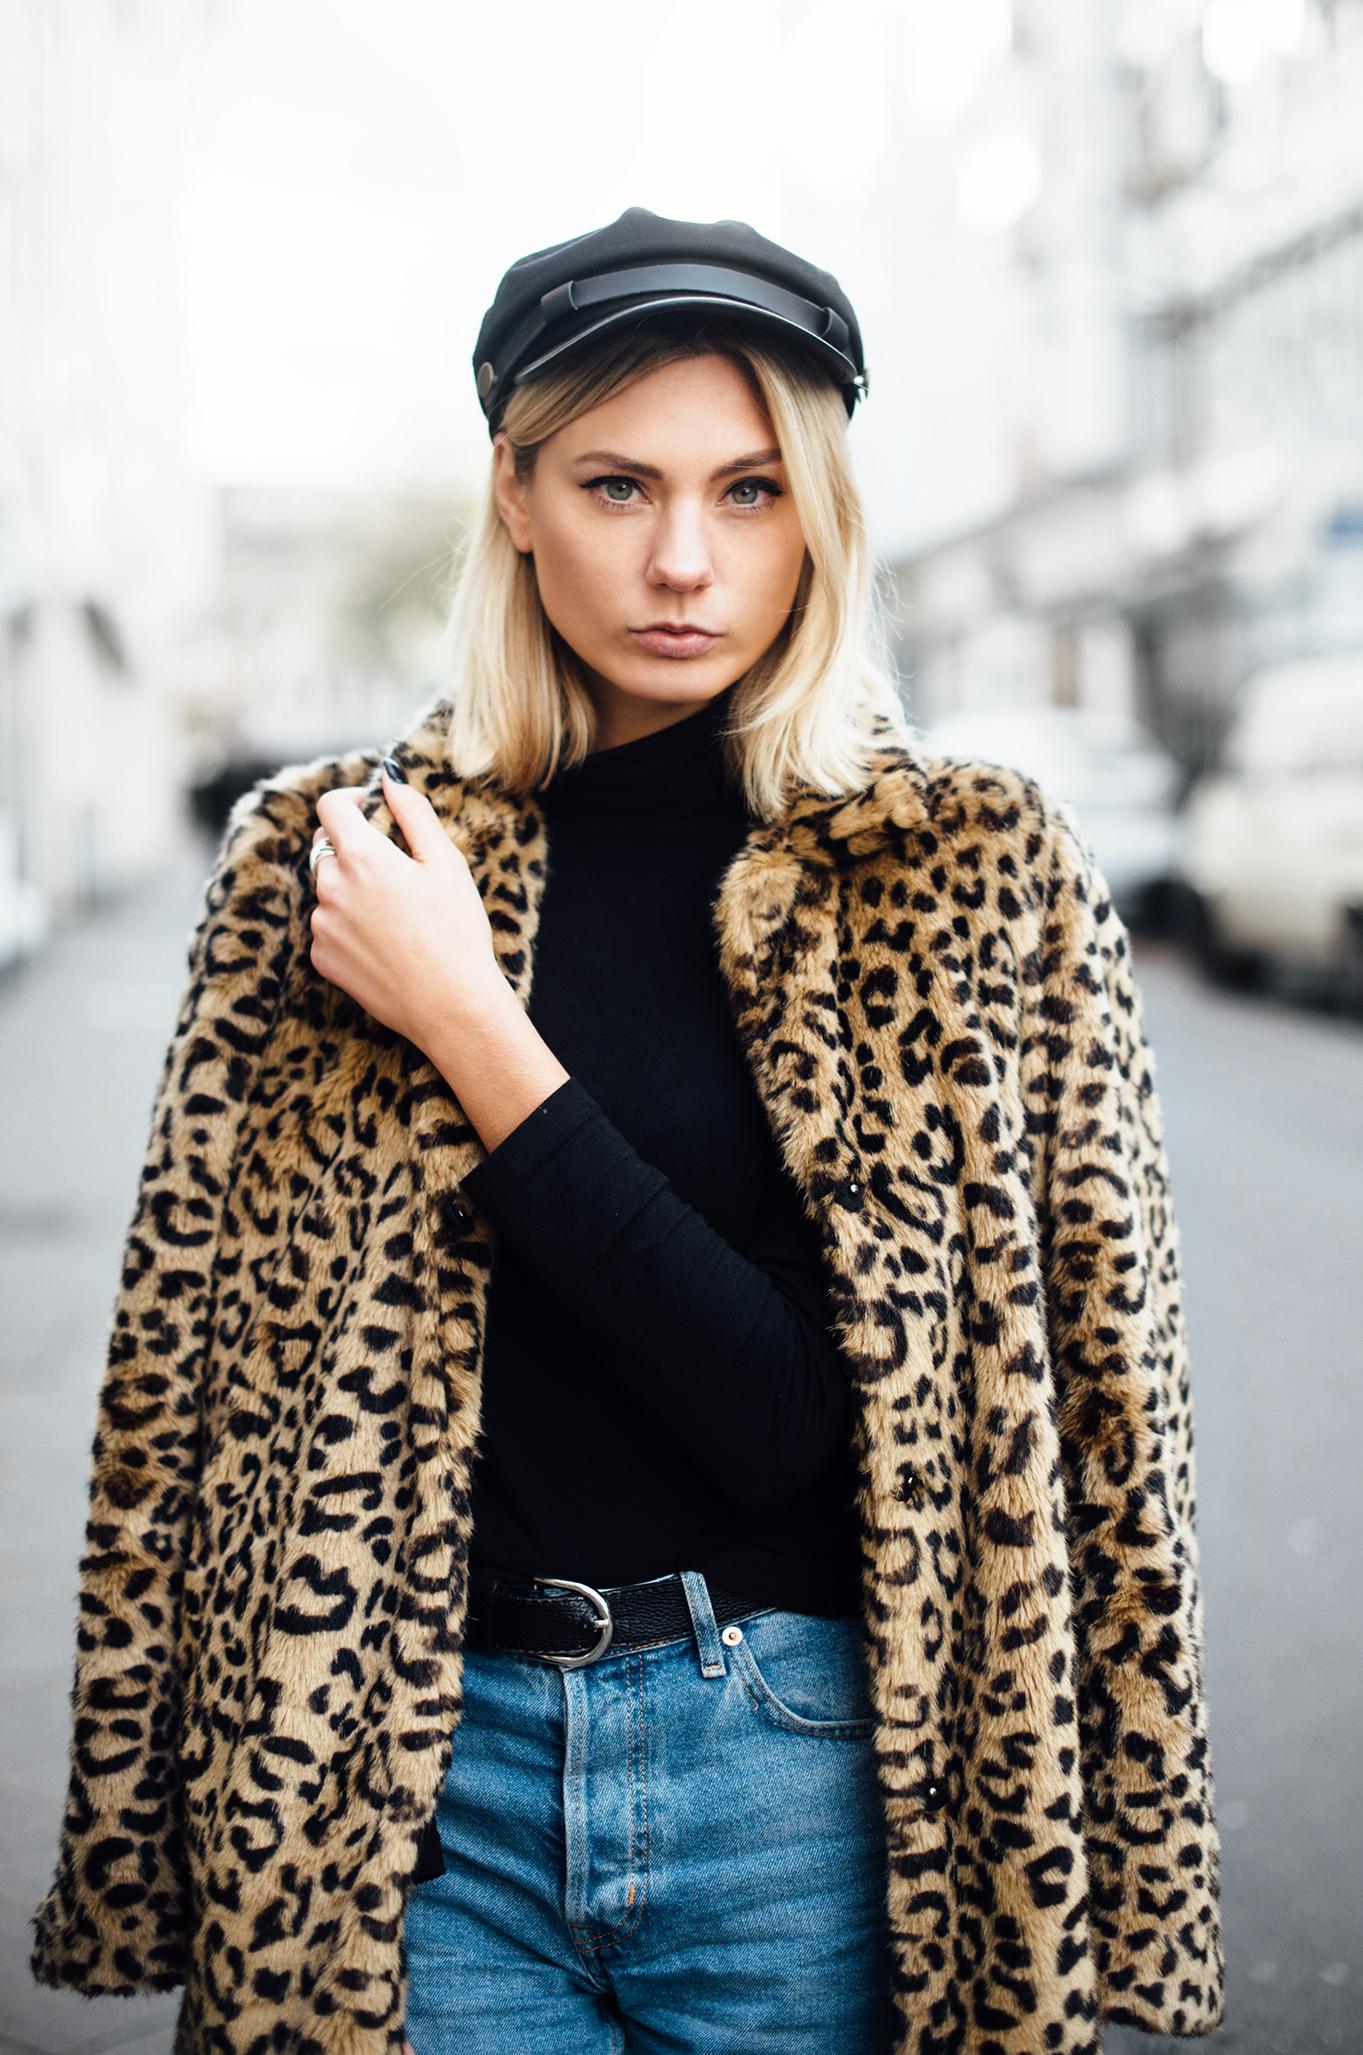 leojacke-zara_mom-jeans_outfit_inspiration_fashionblog_modeblog_kiamisu-10